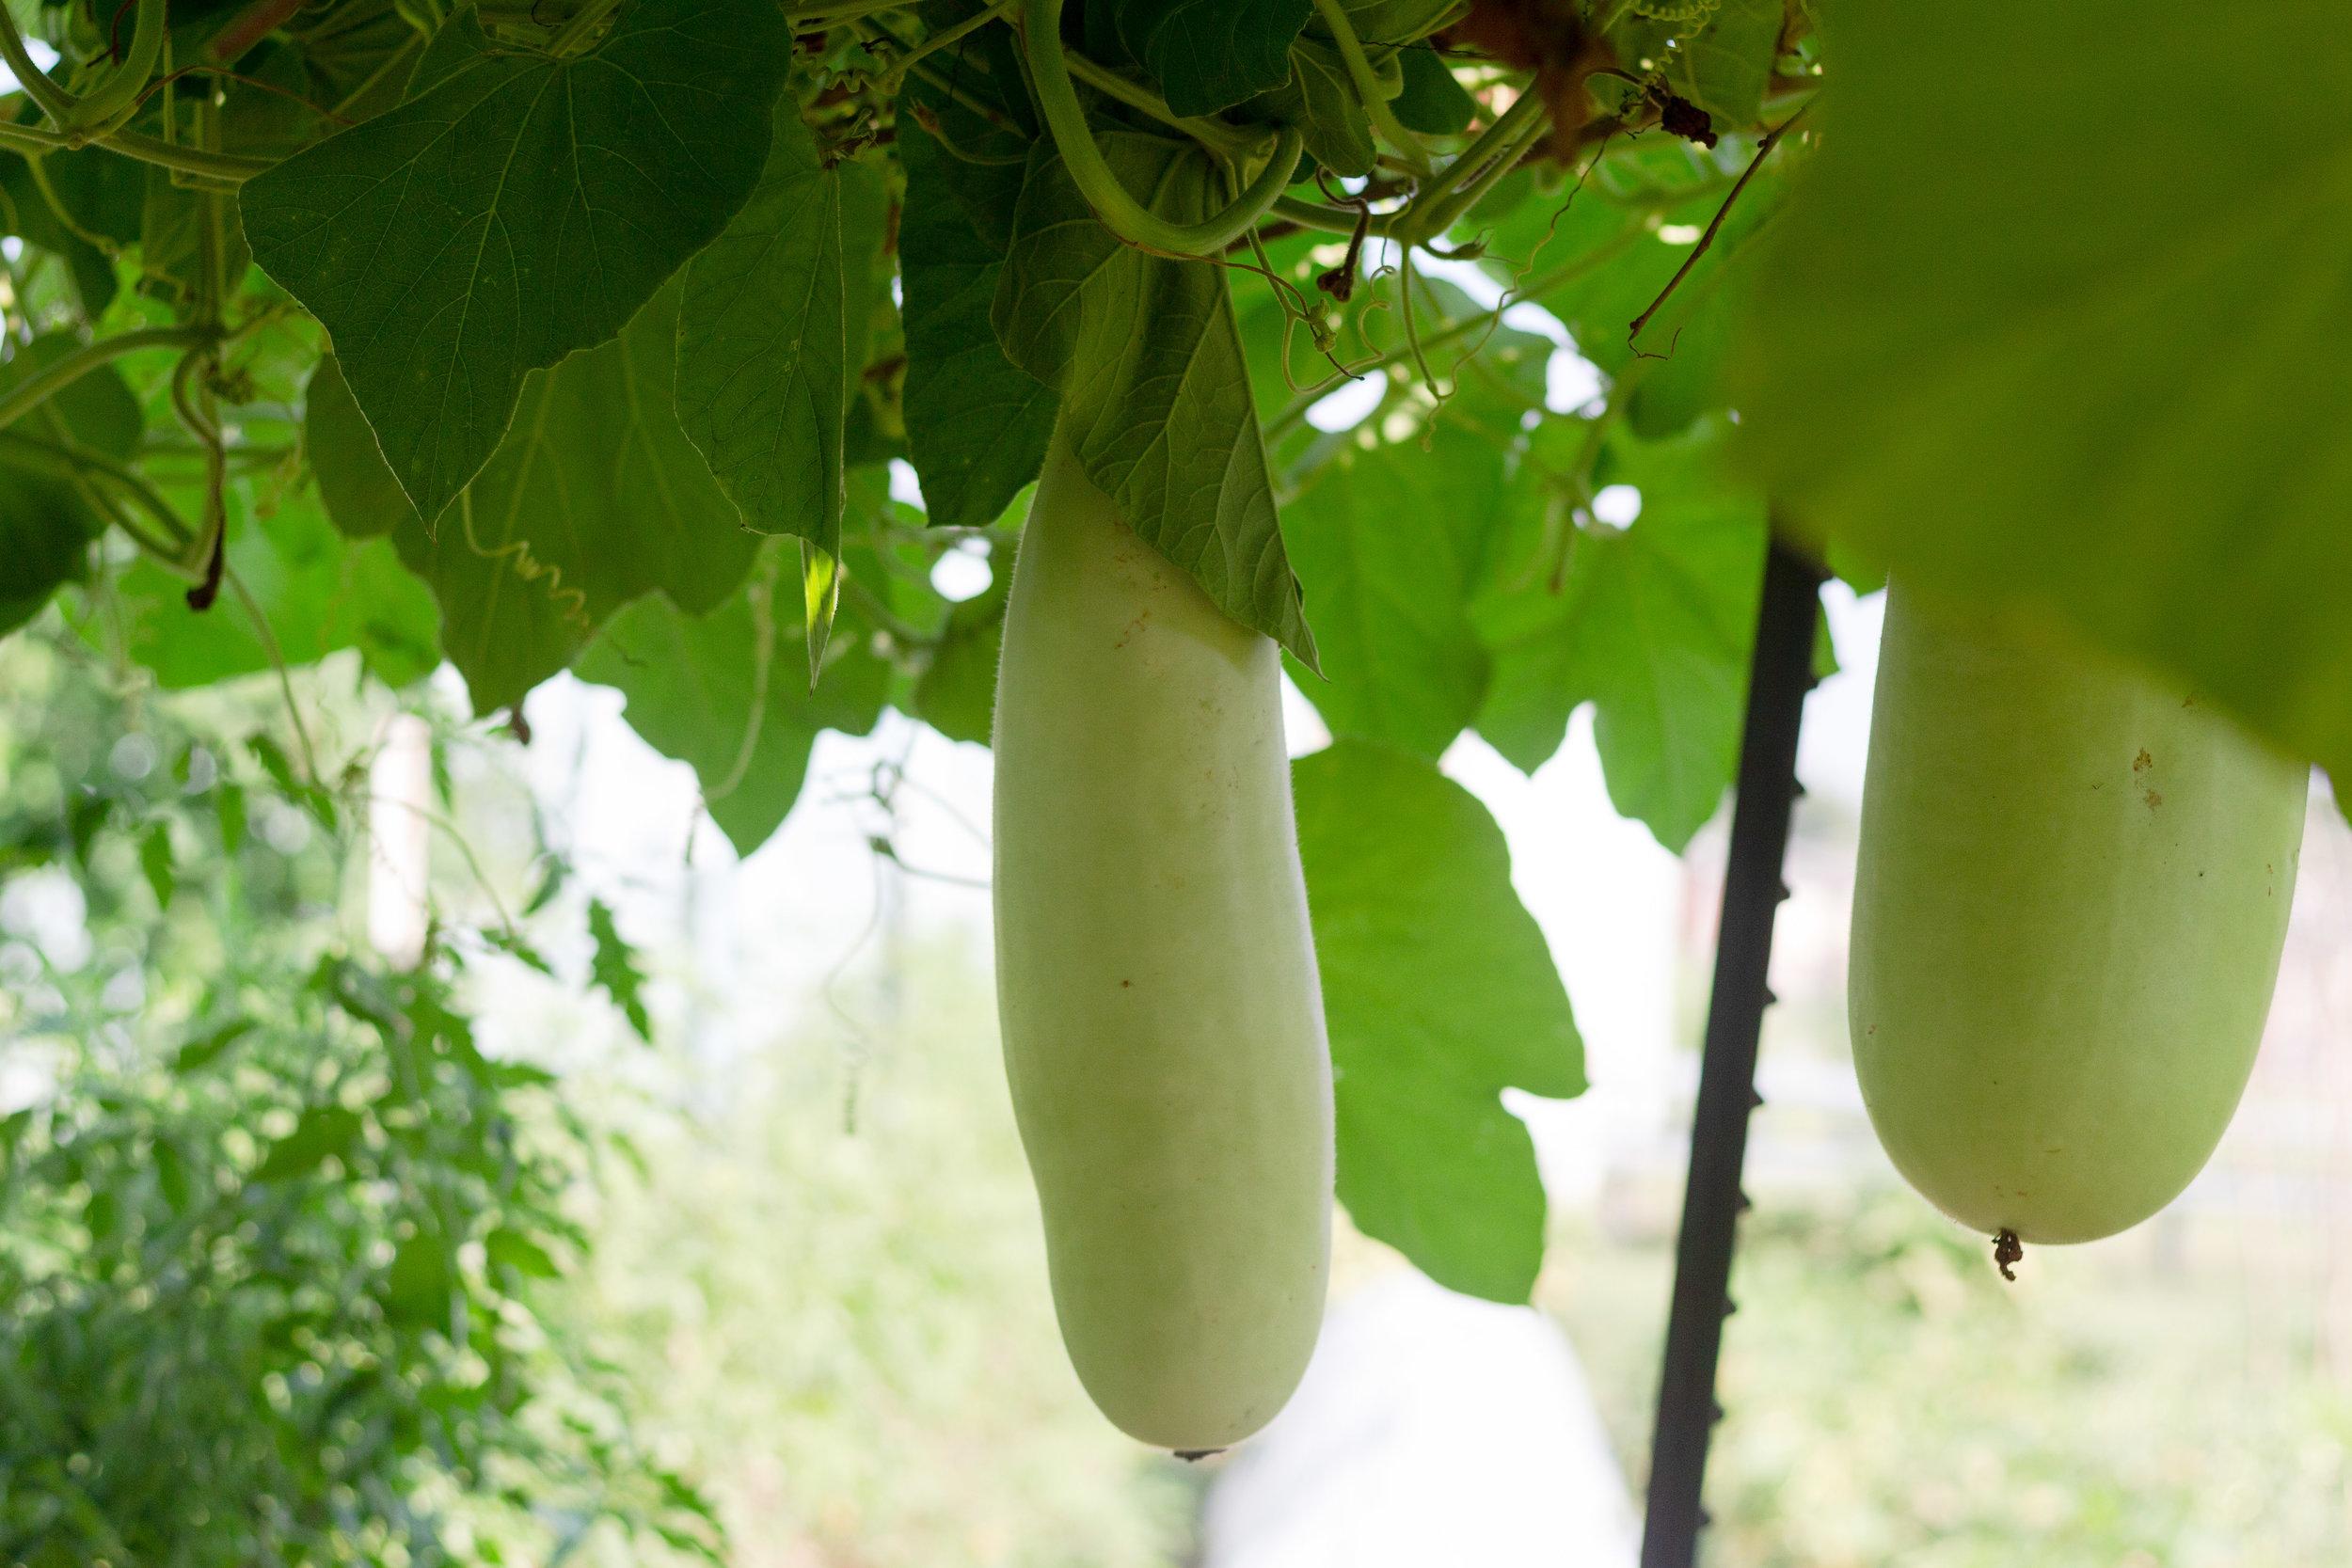 Bottle gourds, also known as calabash